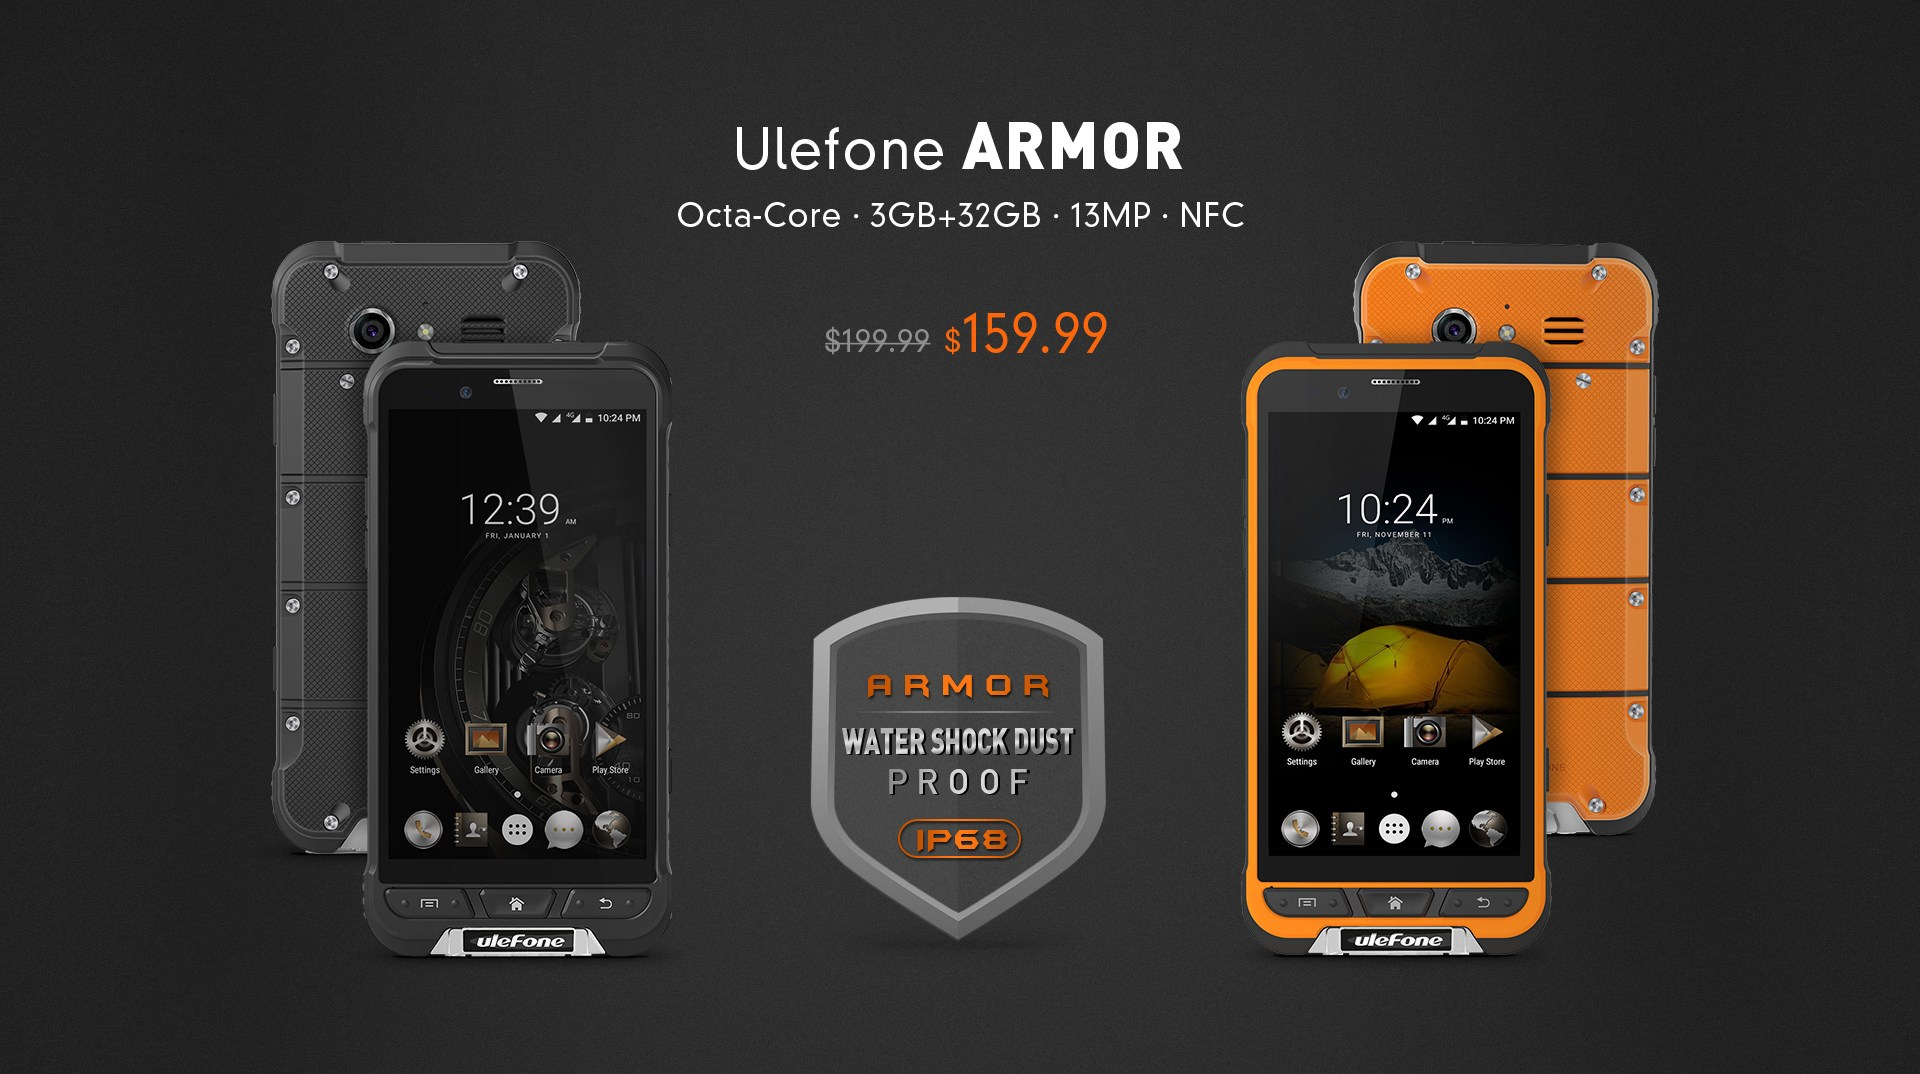 Ulefone Armor substratum theme